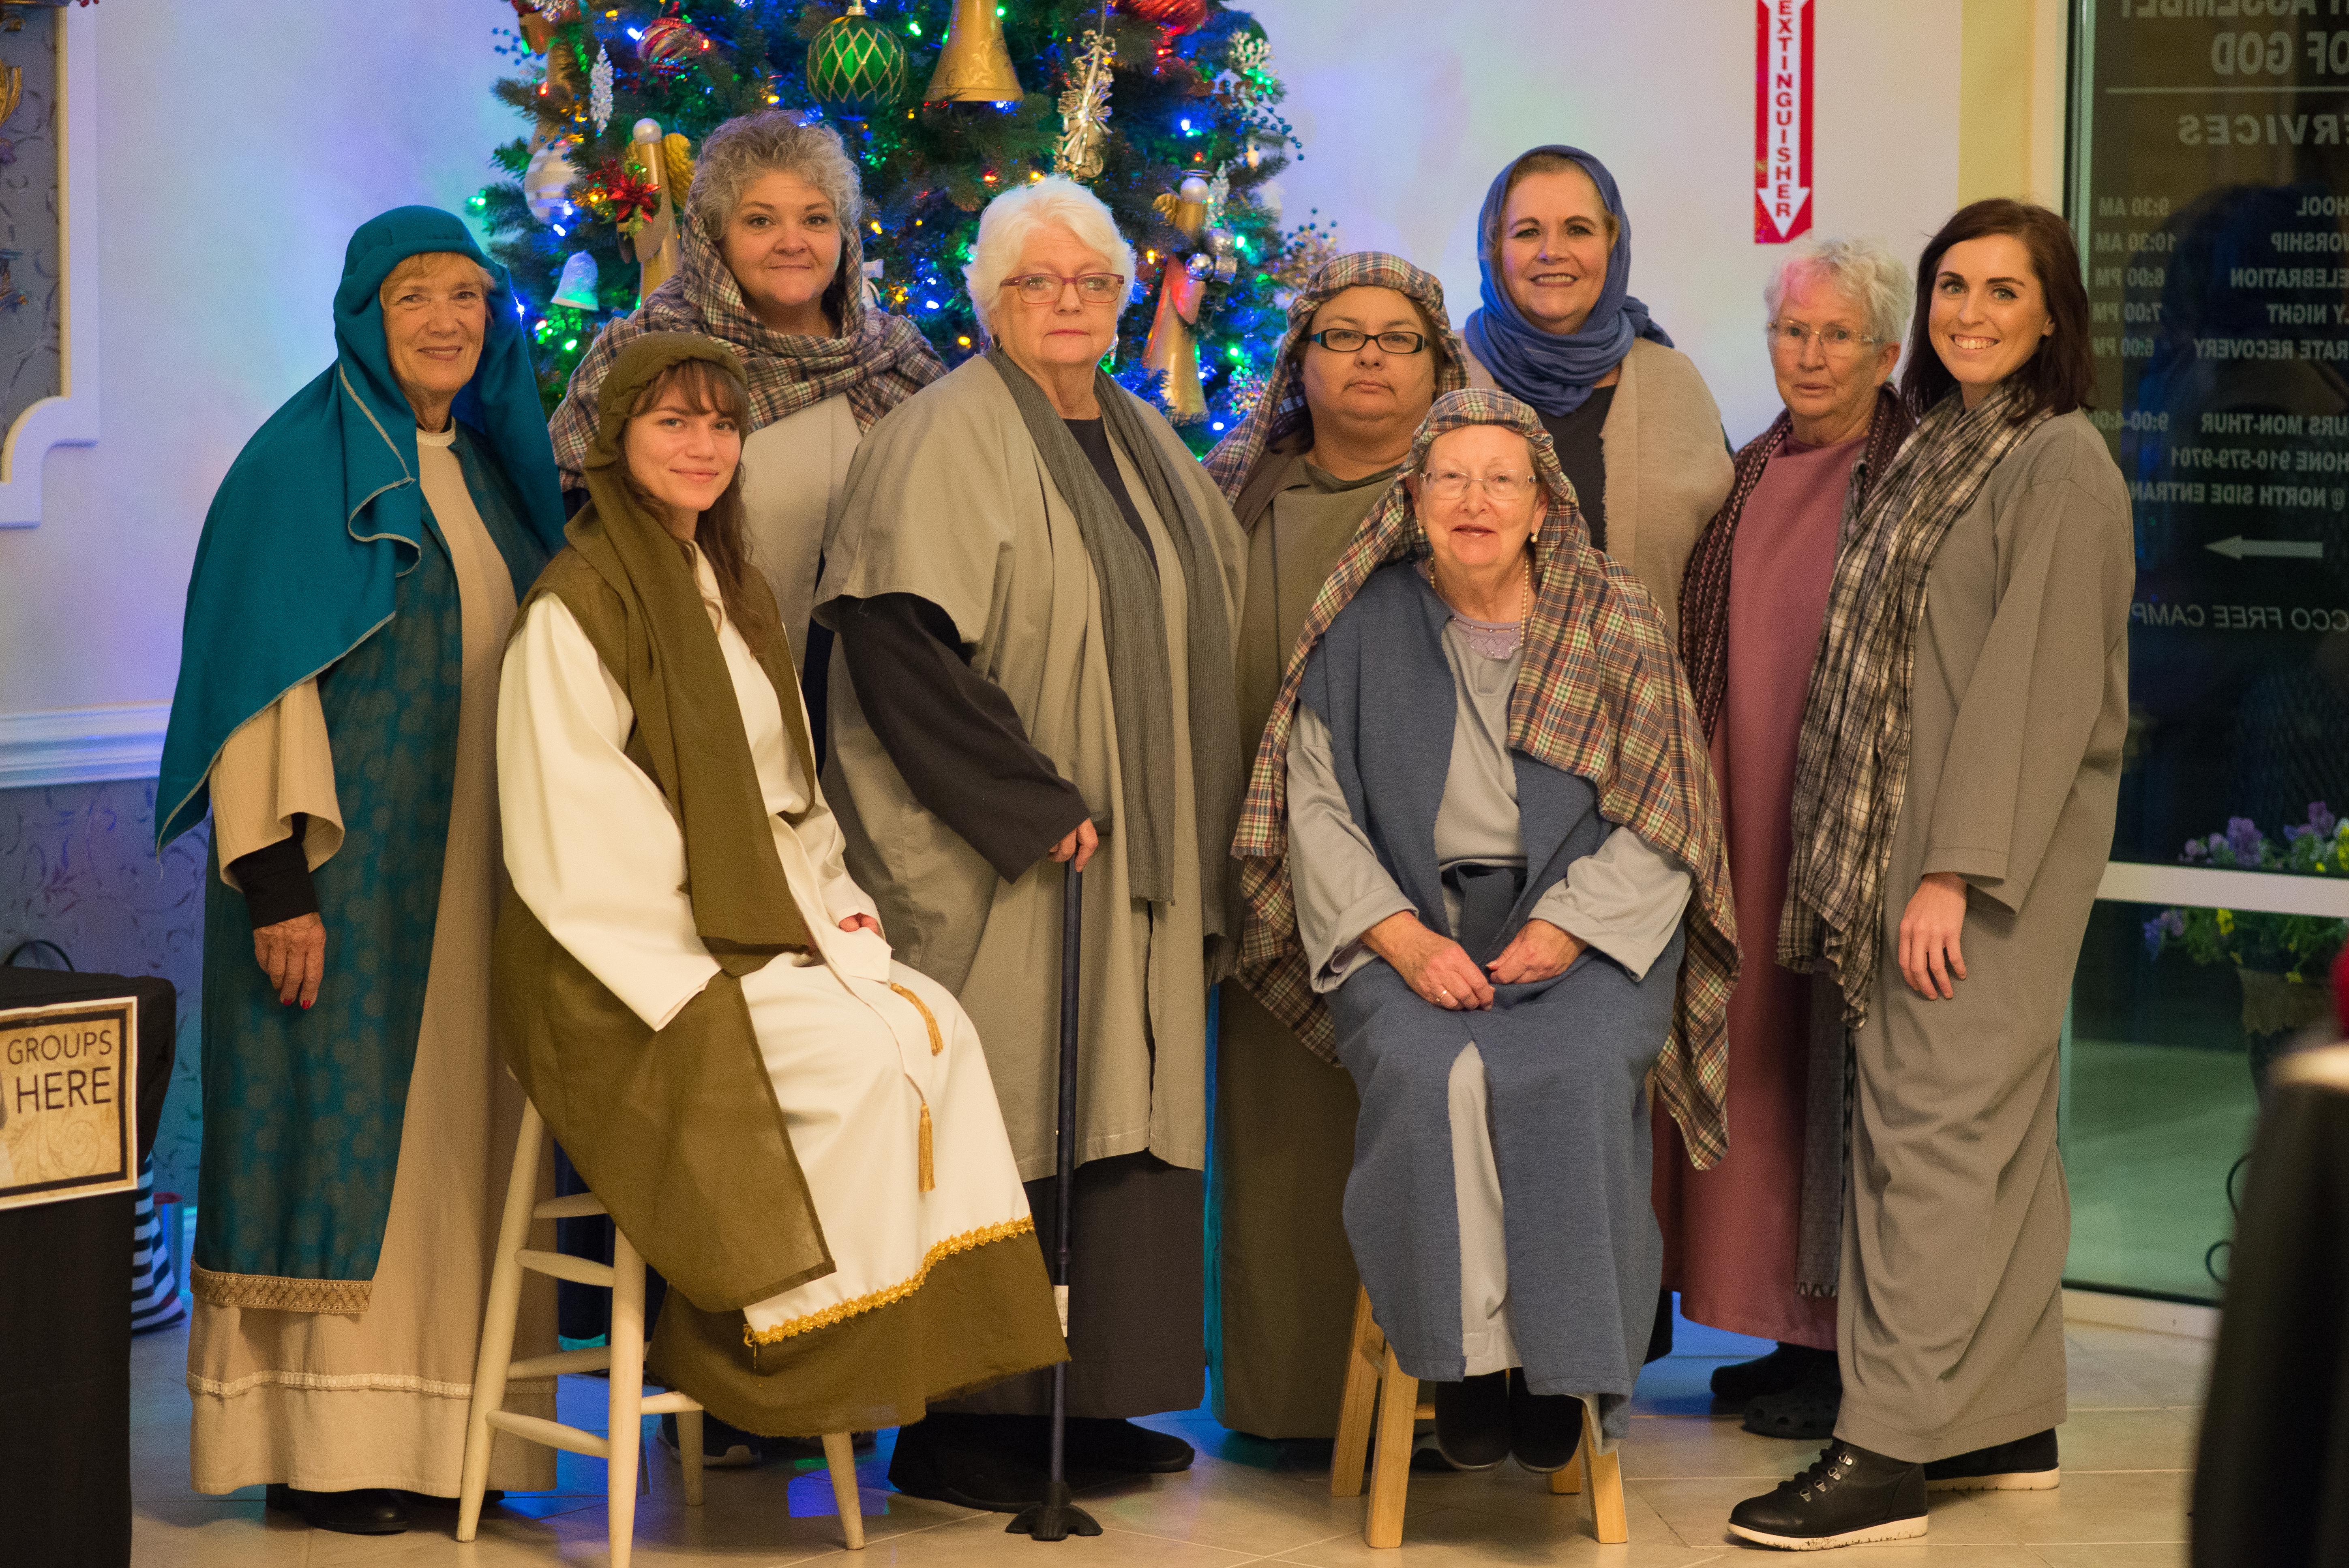 12-1-19_BethlehemLive-1